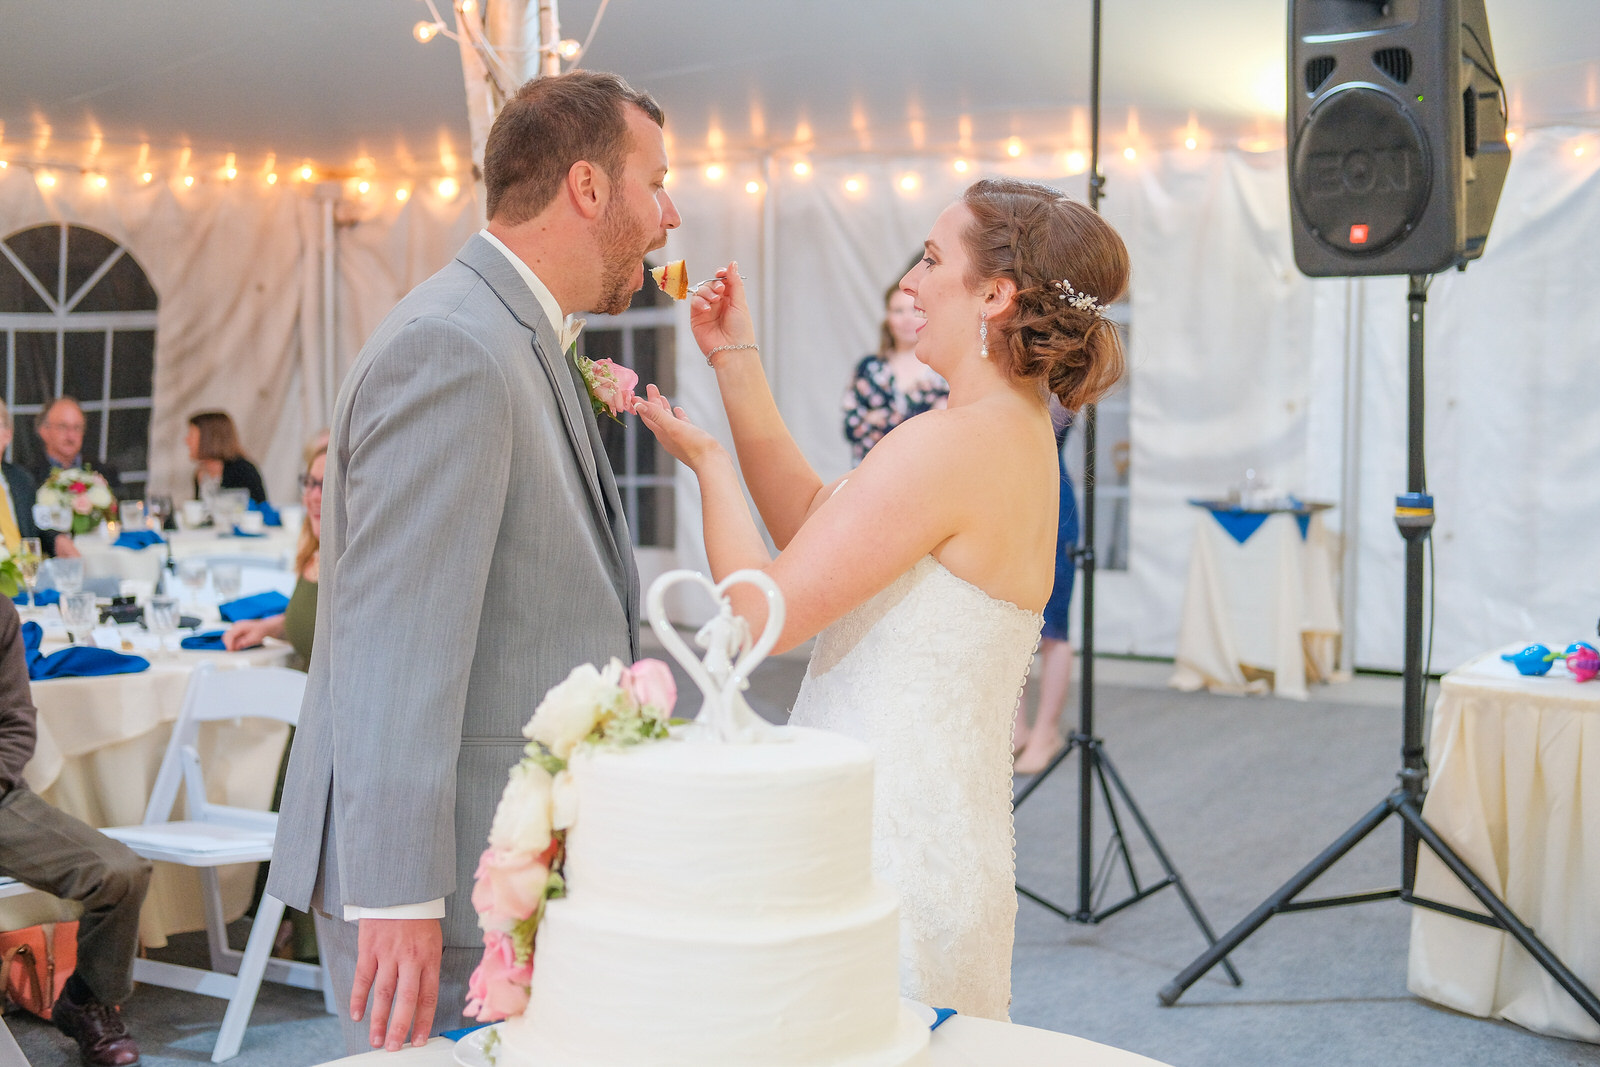 waterville-valley-wedding-photography-1515.jpg